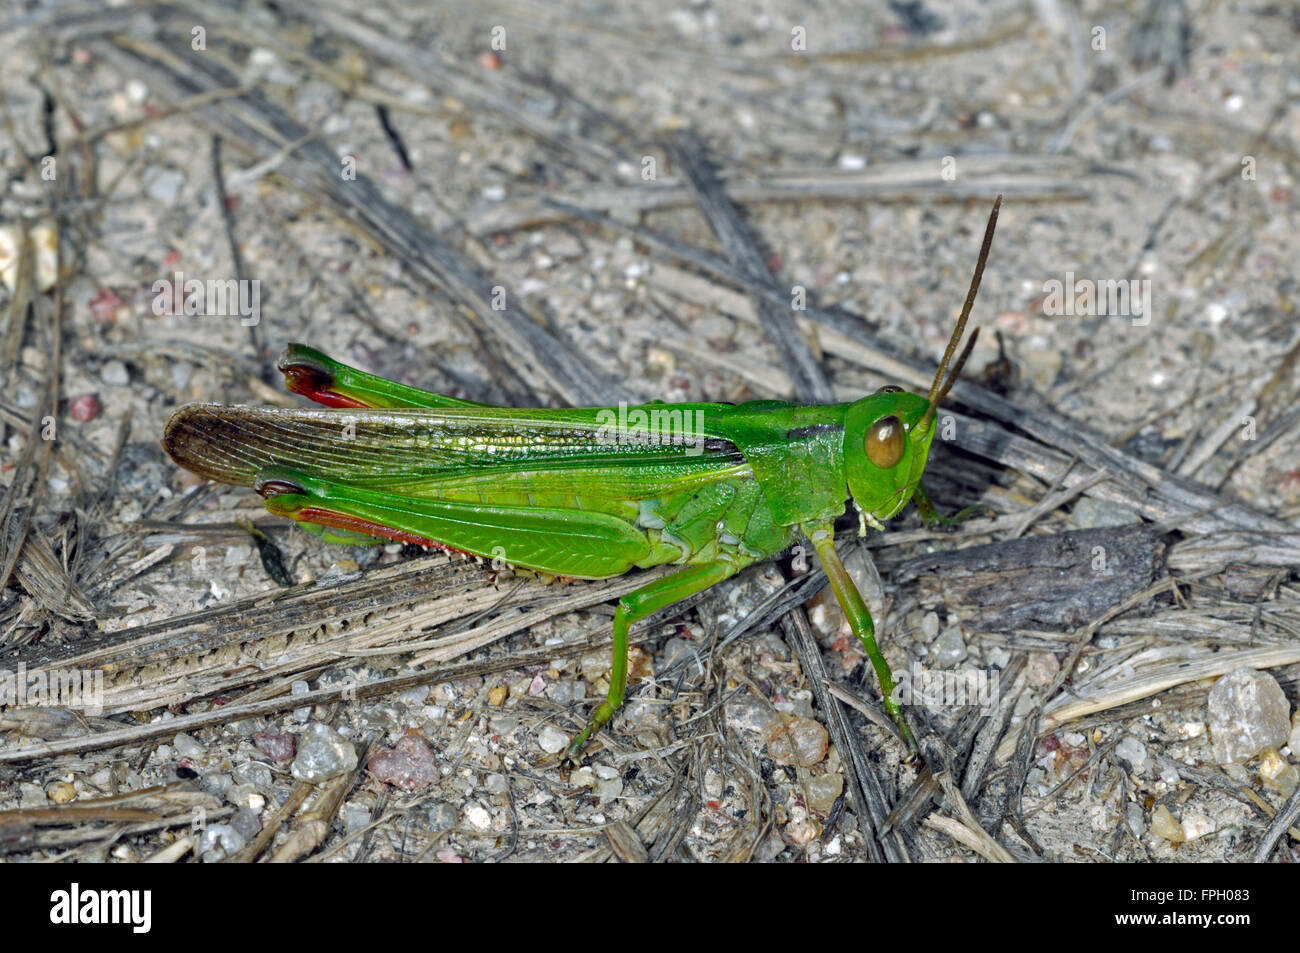 Paracinema tricolor grasshopper on the ground - Stock Image